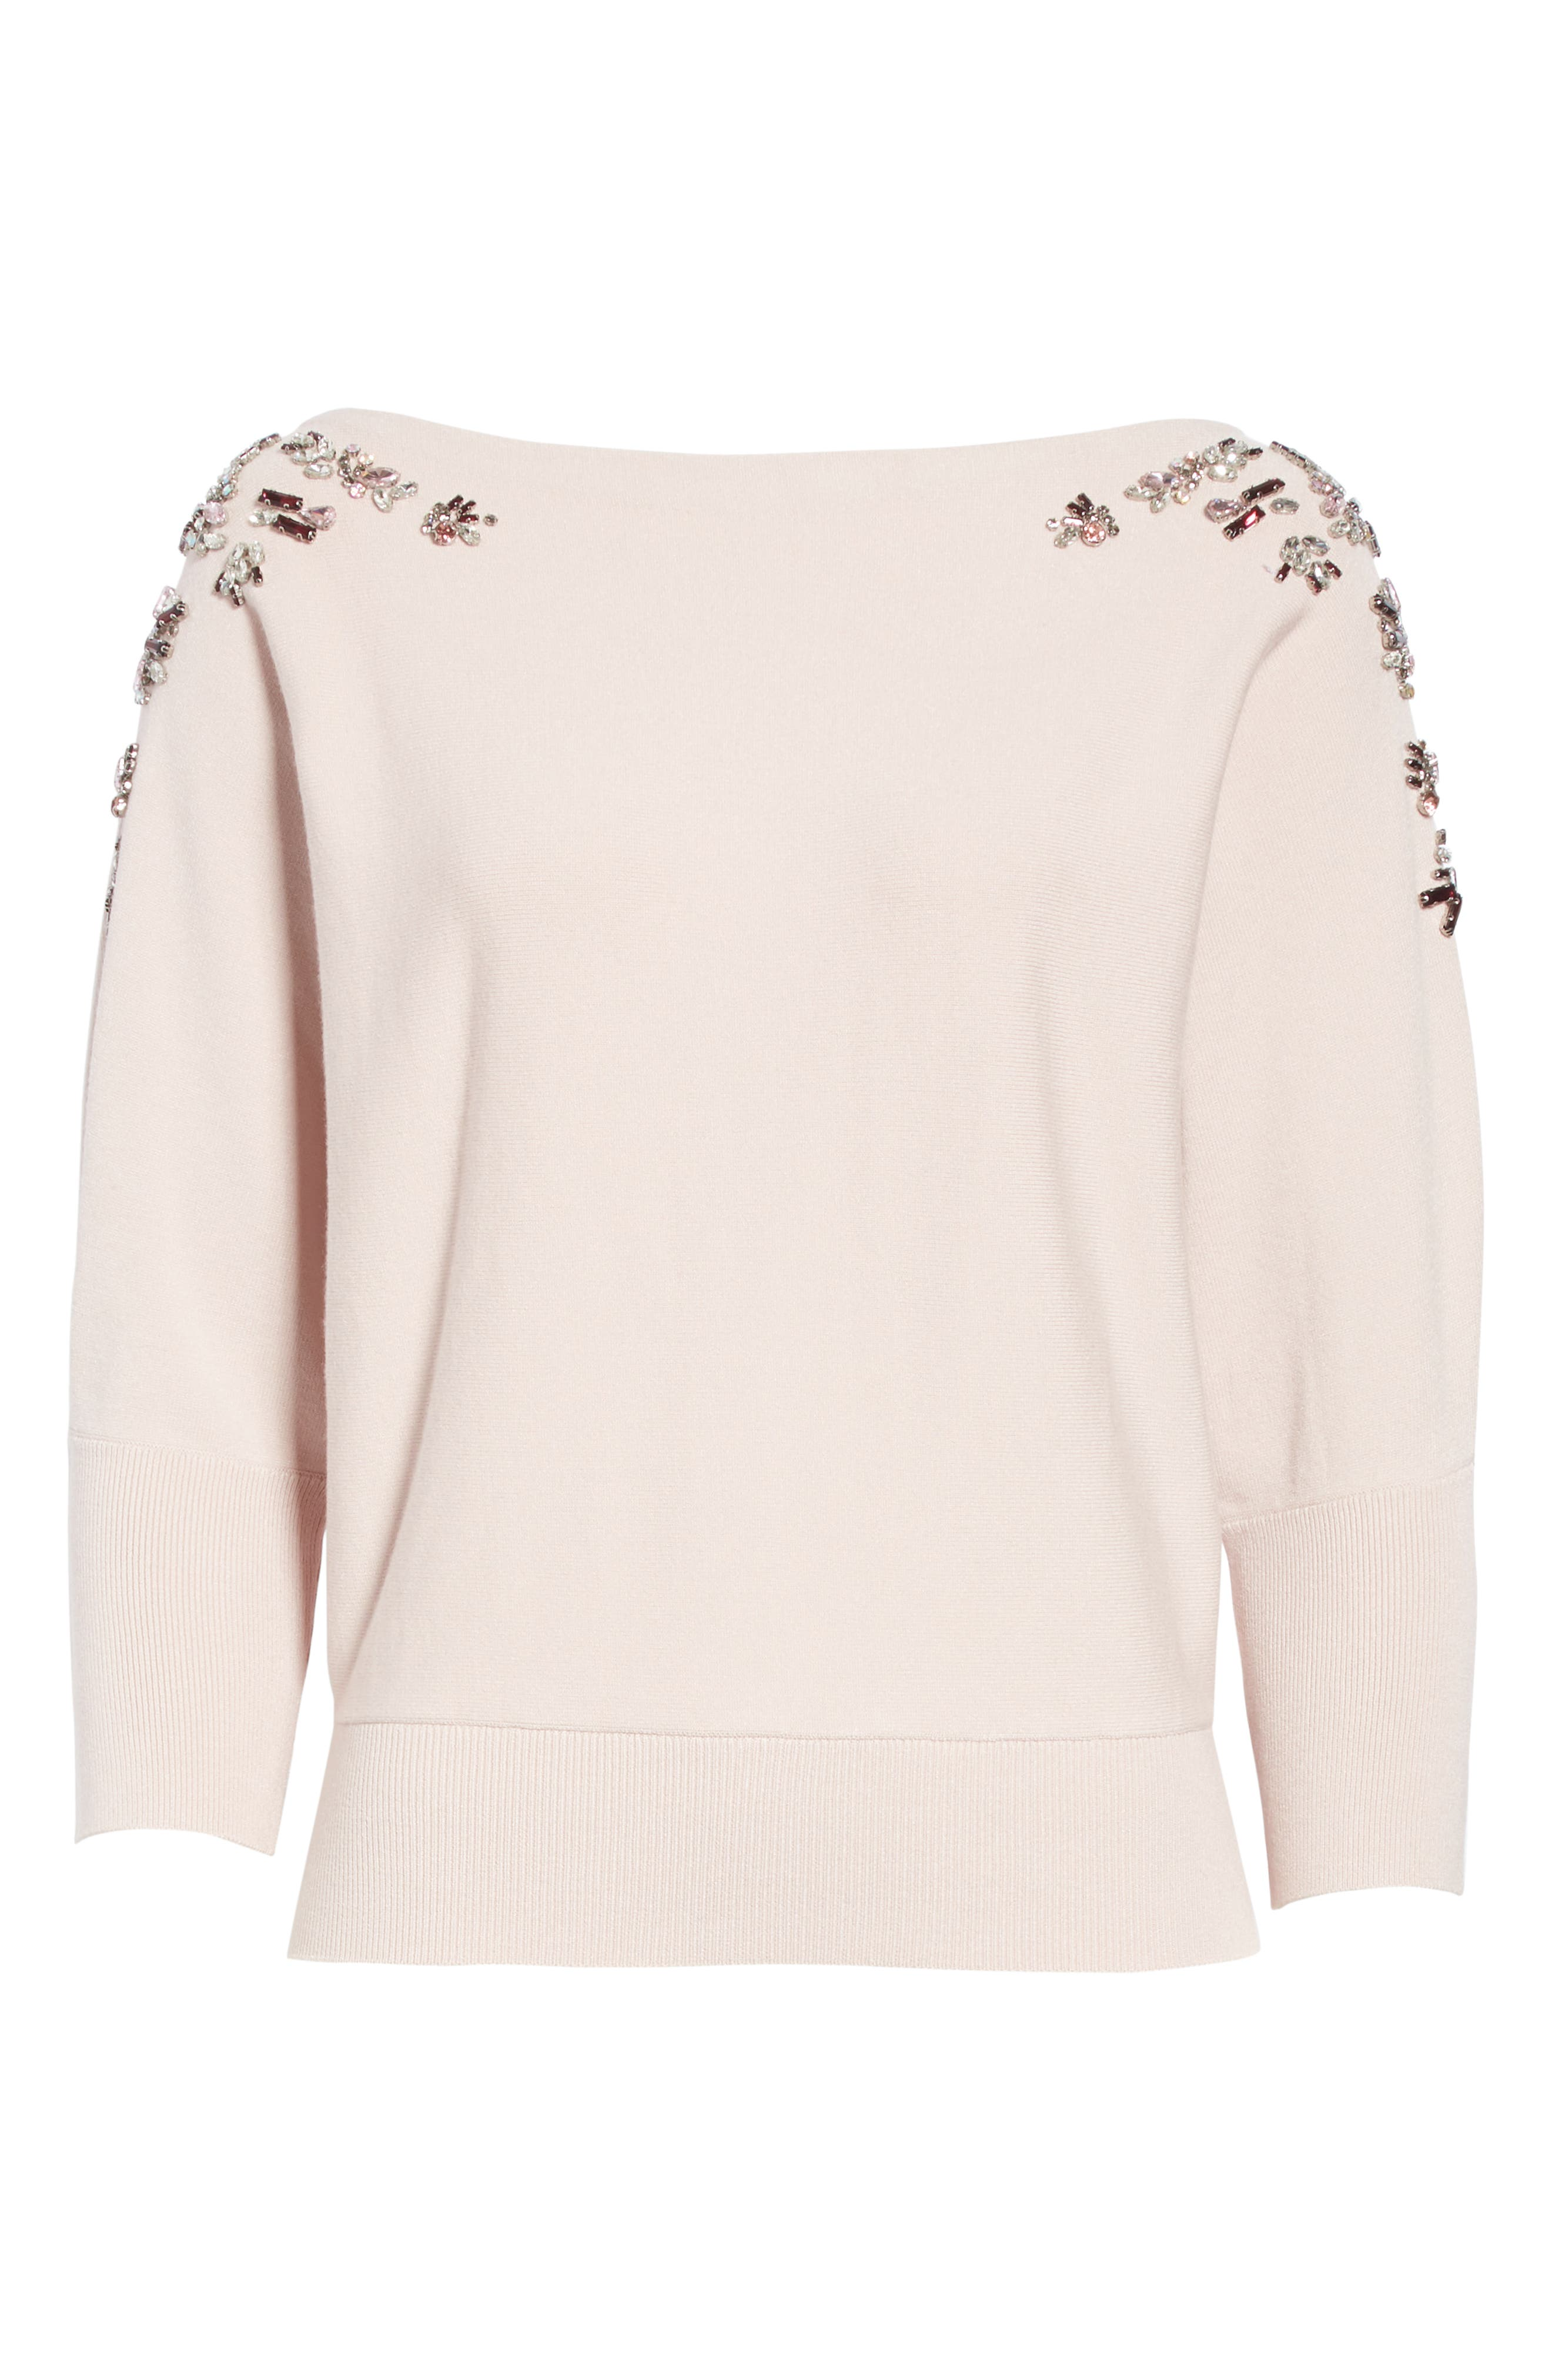 MILLY,                             Faux Gem Embellished Sweater,                             Alternate thumbnail 6, color,                             BALLET